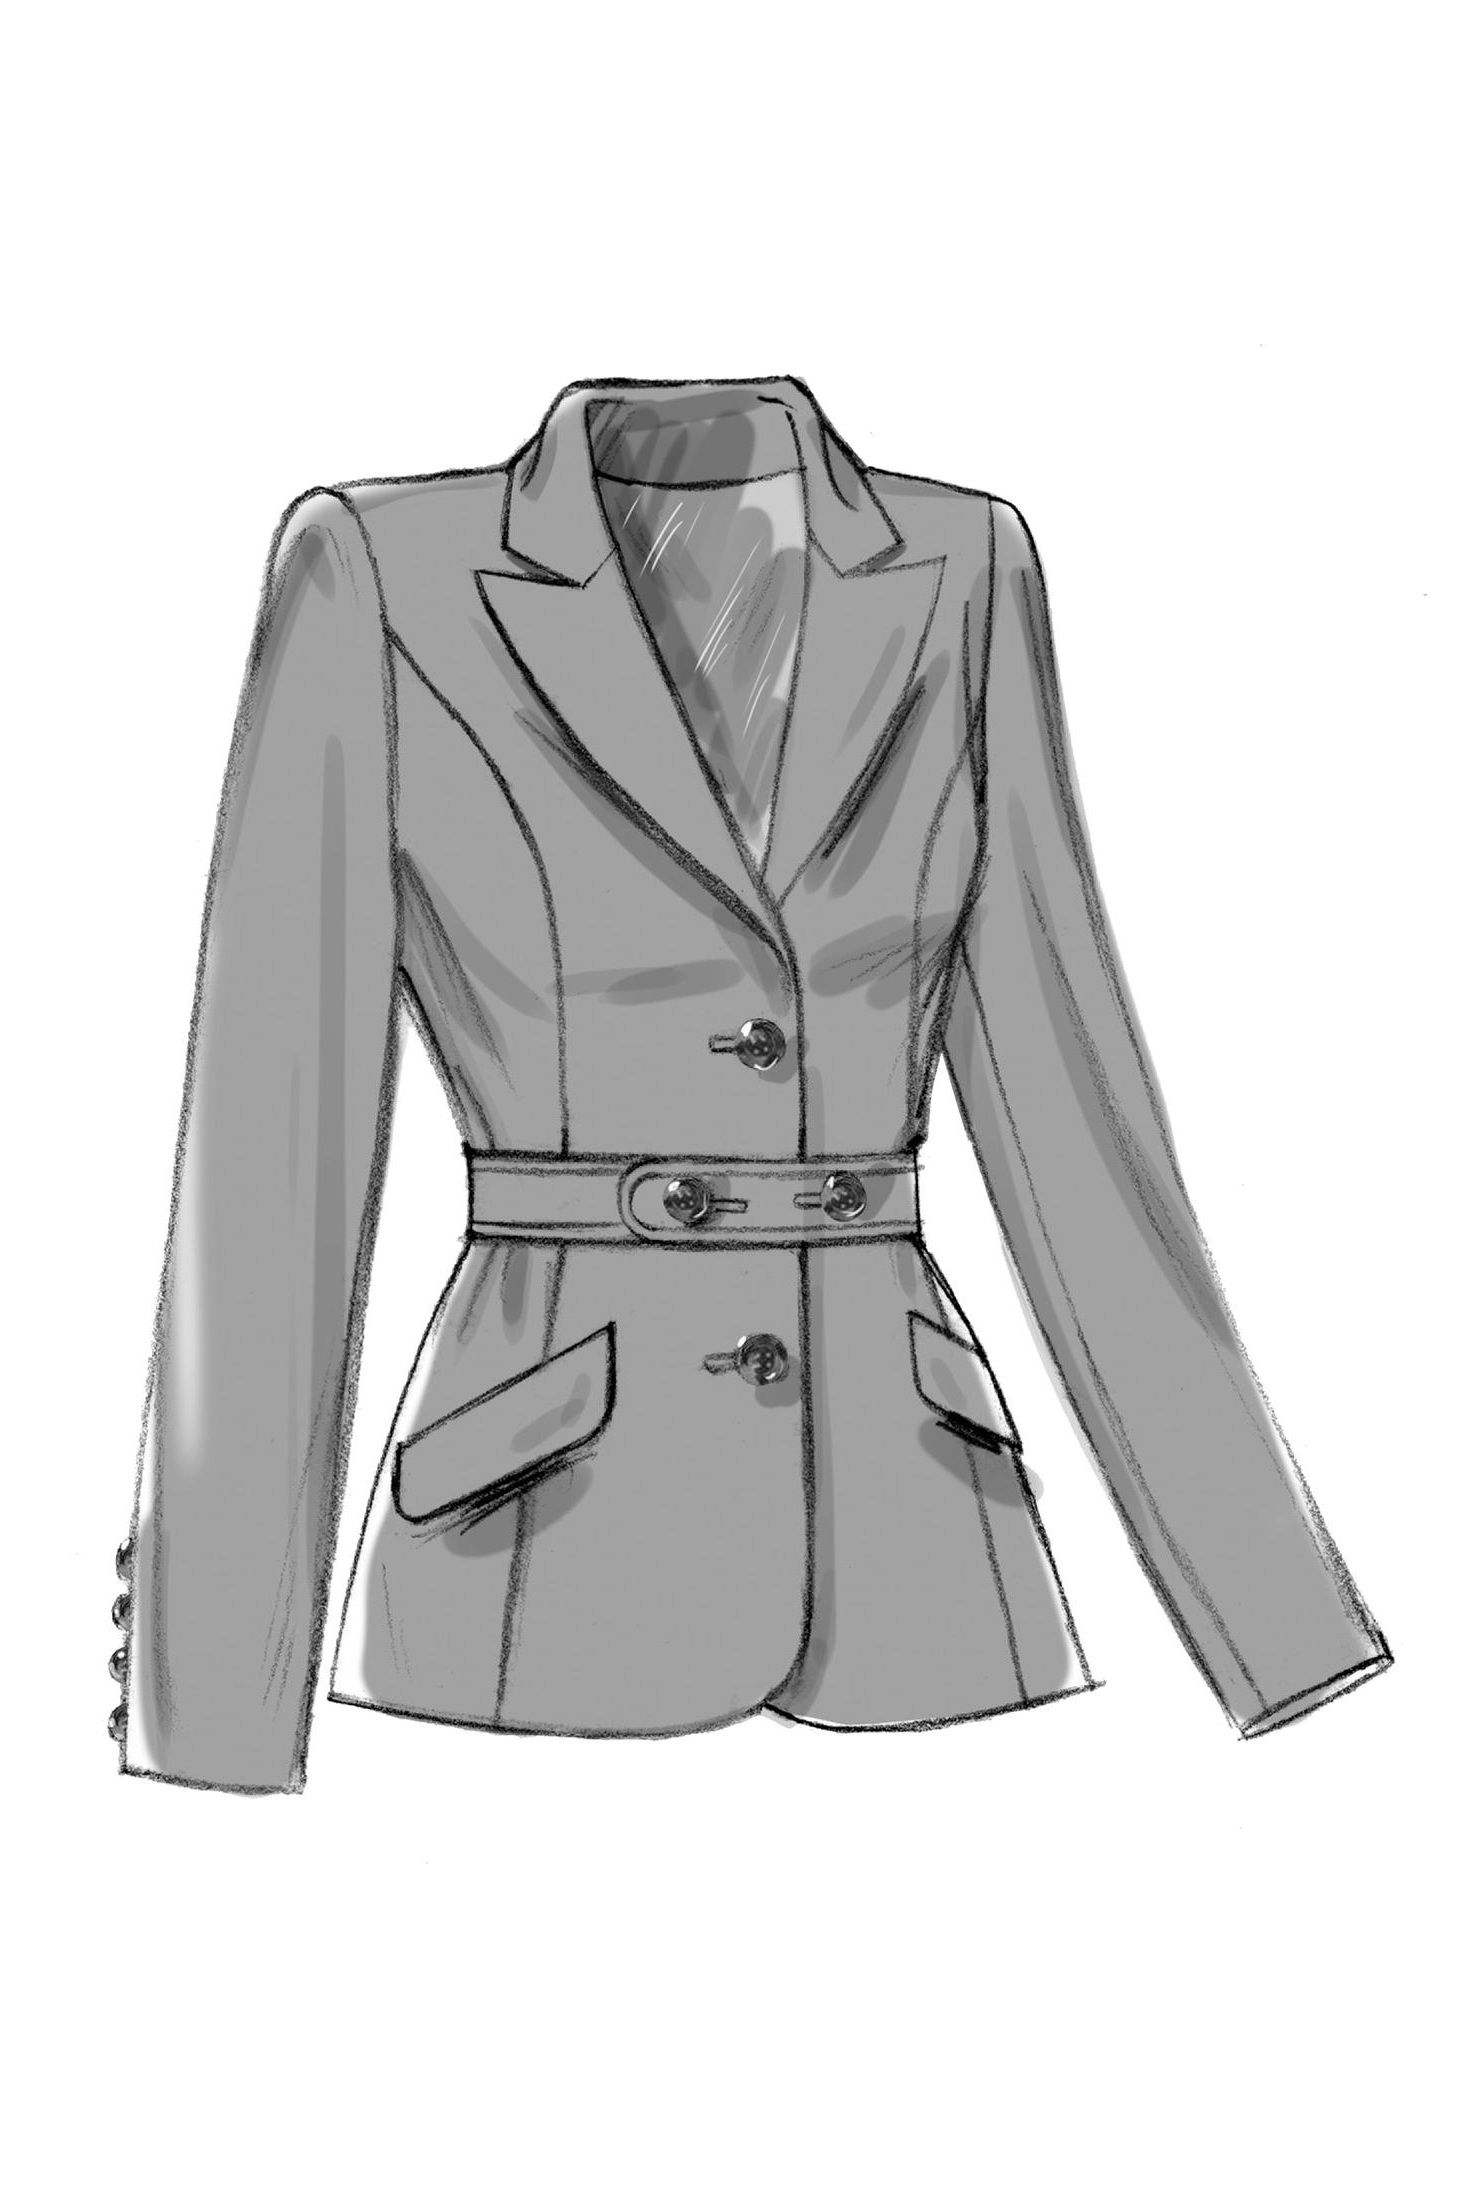 Miss Fisher, Travel Suit Costume Pattern. Butterick 6433. Jodhpurs. 1920s Costume Pattern